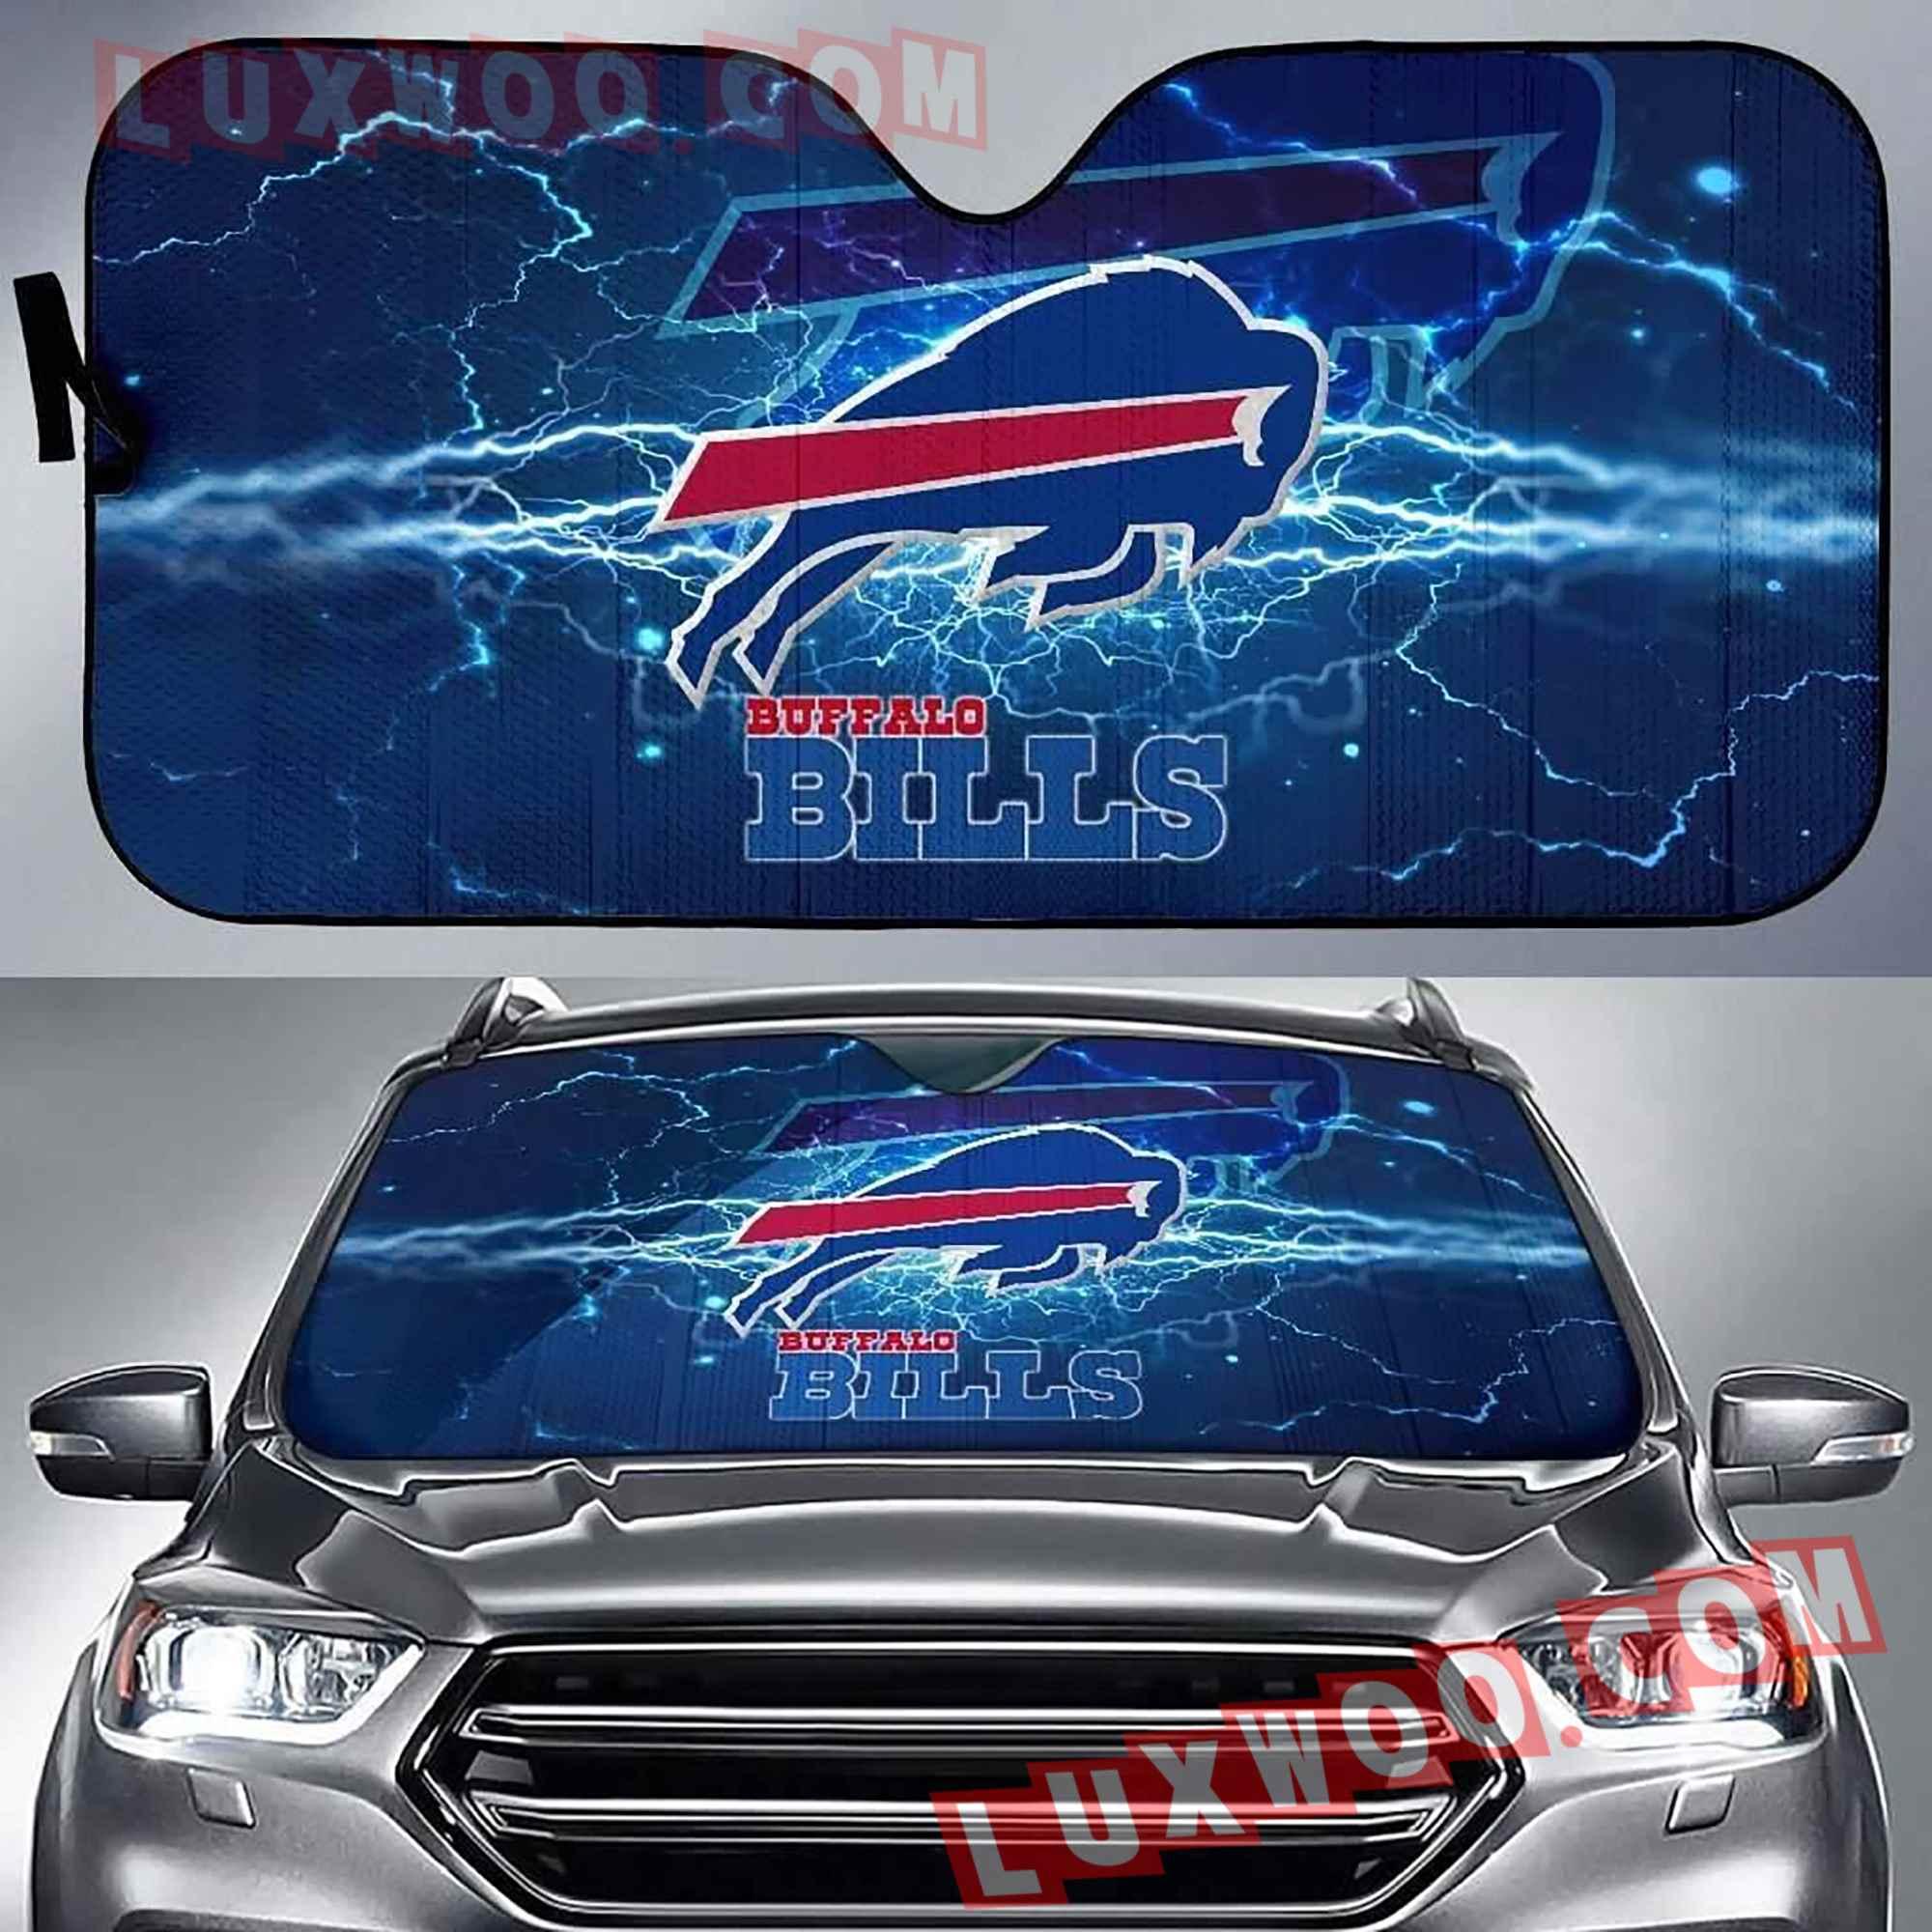 Buffalo Bills Nfl 3d Auto Sun Shades V1